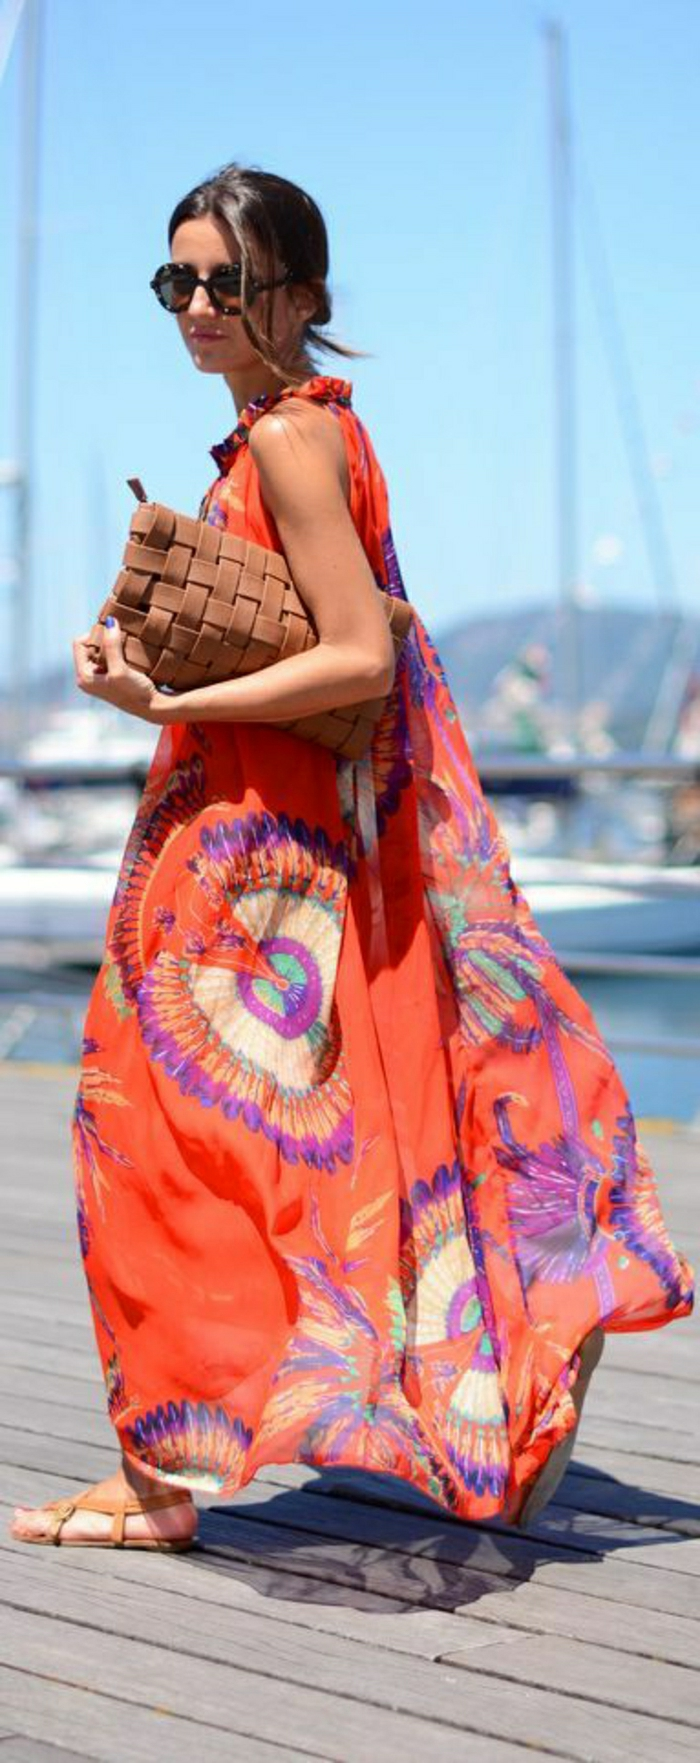 lange-Sommerkleider-lüftiges-Modell-rot-bunte-Ornamente-Clutch-Sonnenbrille